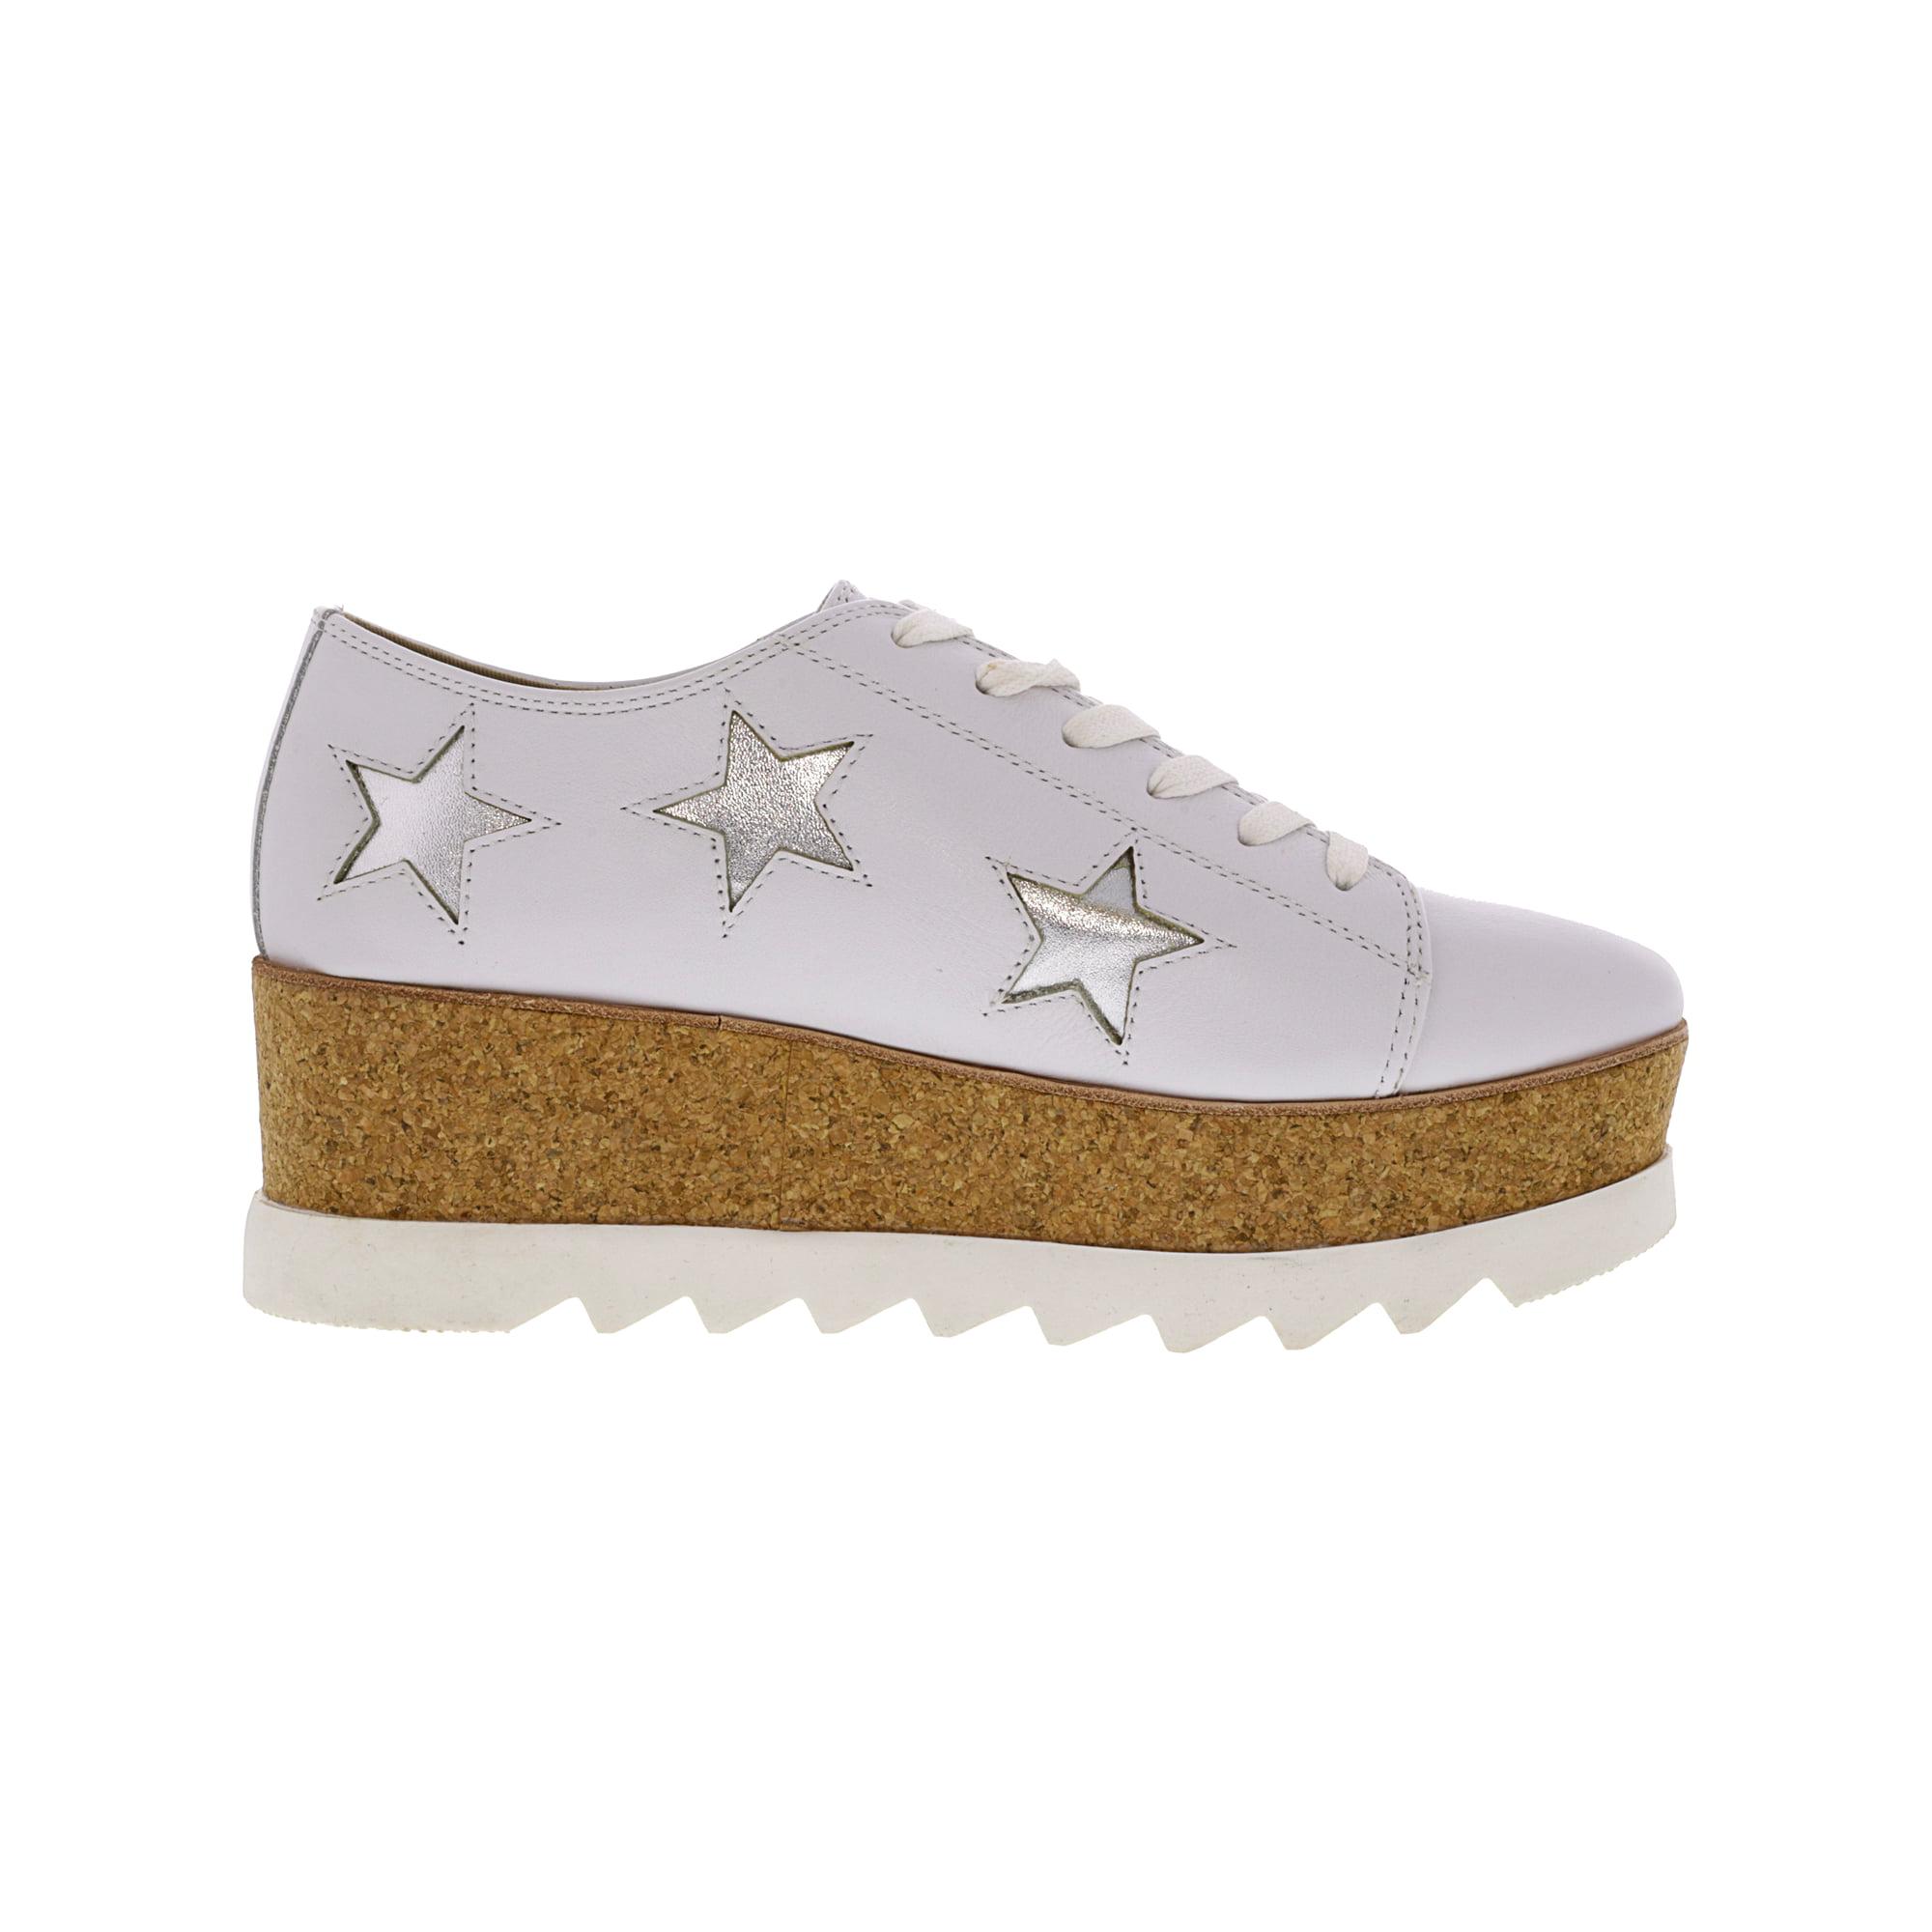 b5952fecdc7 Steve Madden Women s Korrie-S Nude Multi Ankle-High Leather Fashion Sneaker  - 5.5M